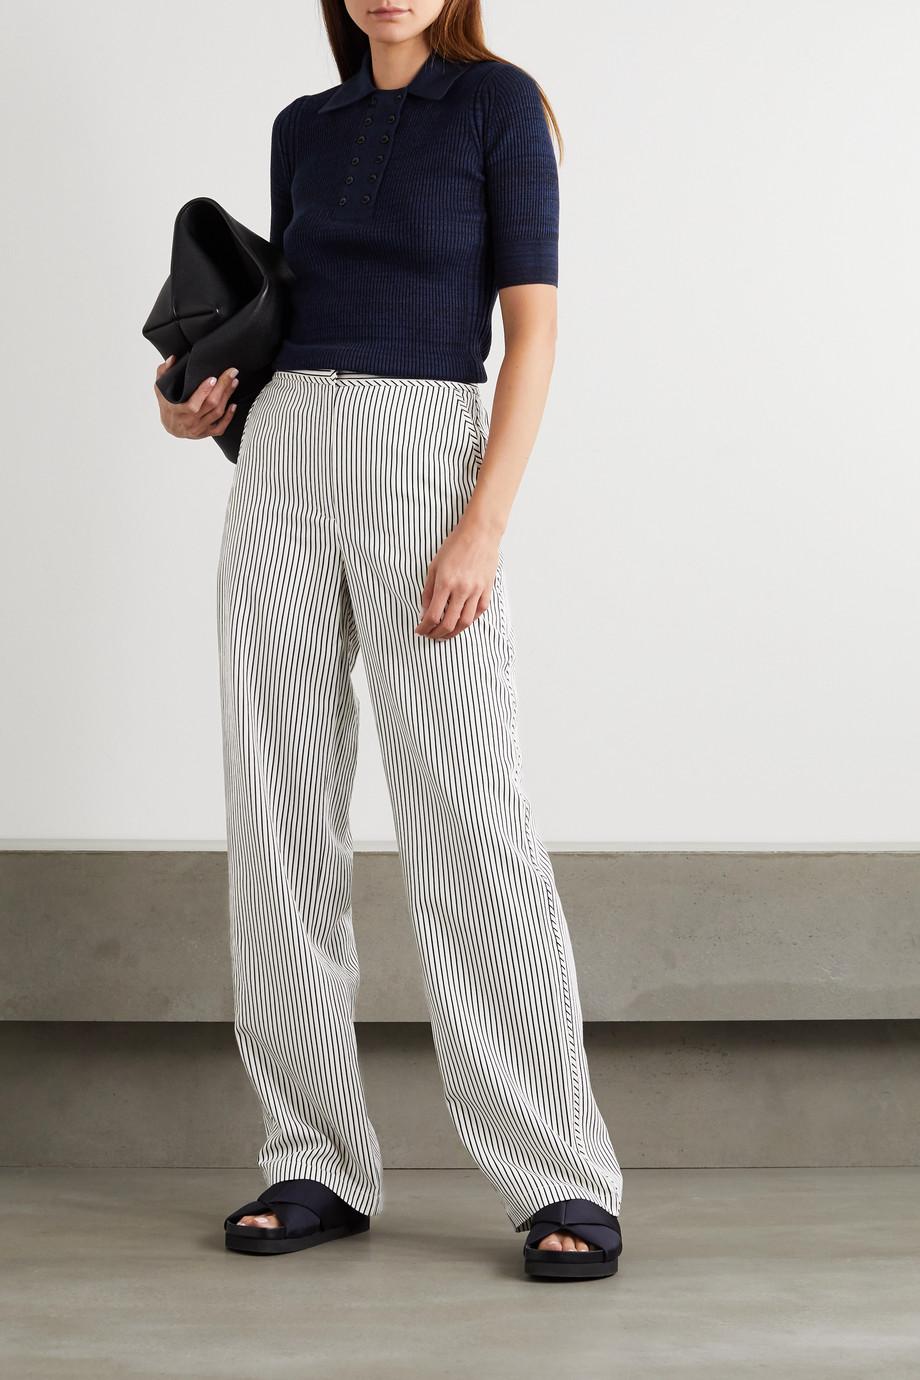 Proenza Schouler White Label 条纹绉纱阔腿裤